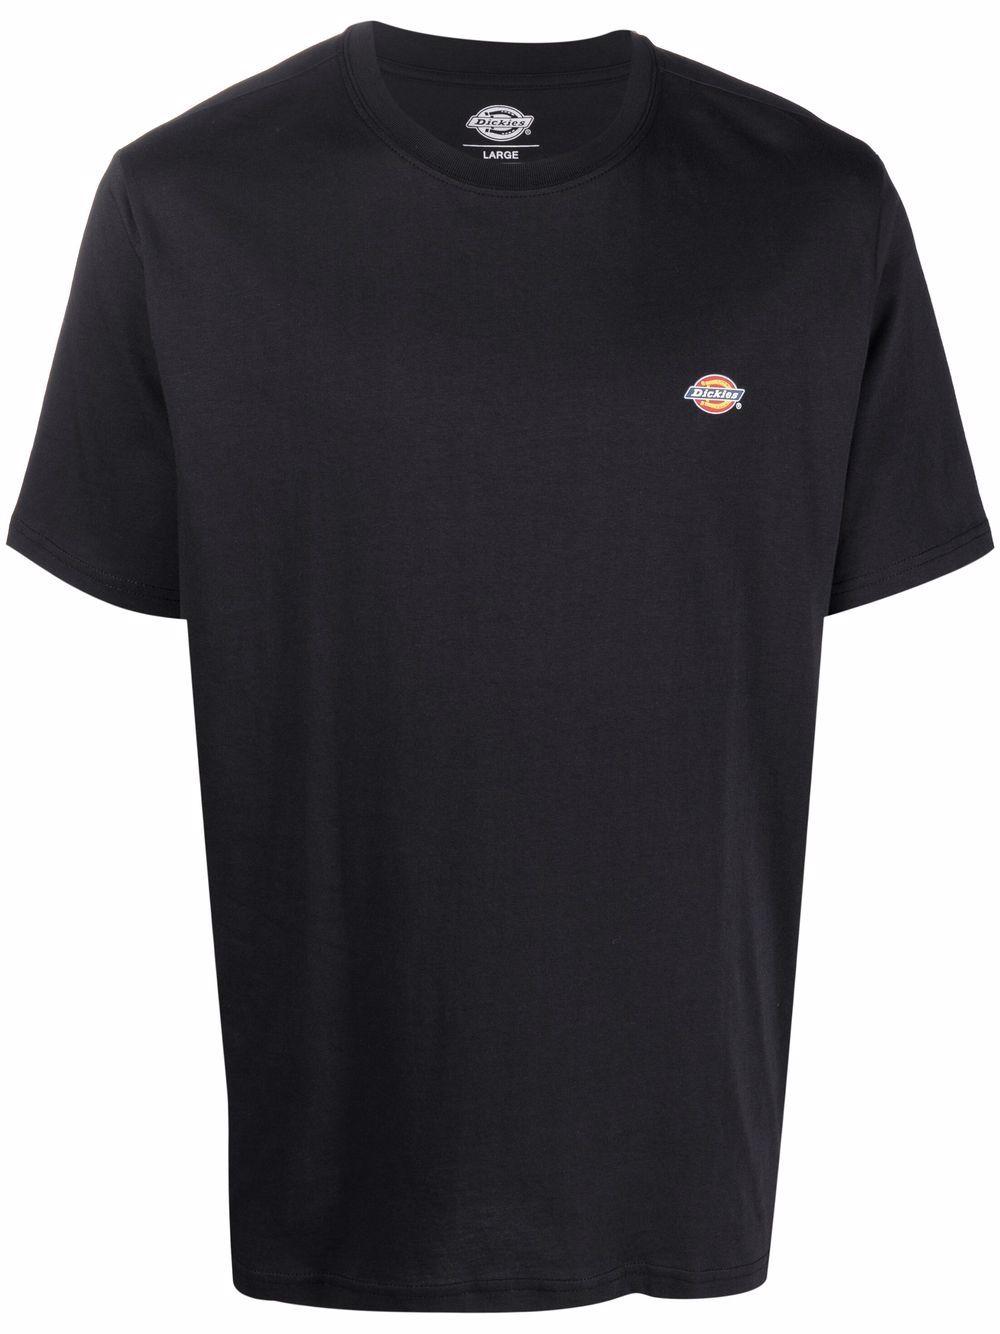 T-shirt con logo Nera in Cotone Uomo DICKIES | T-shirt | DK0A4XDBBLK1